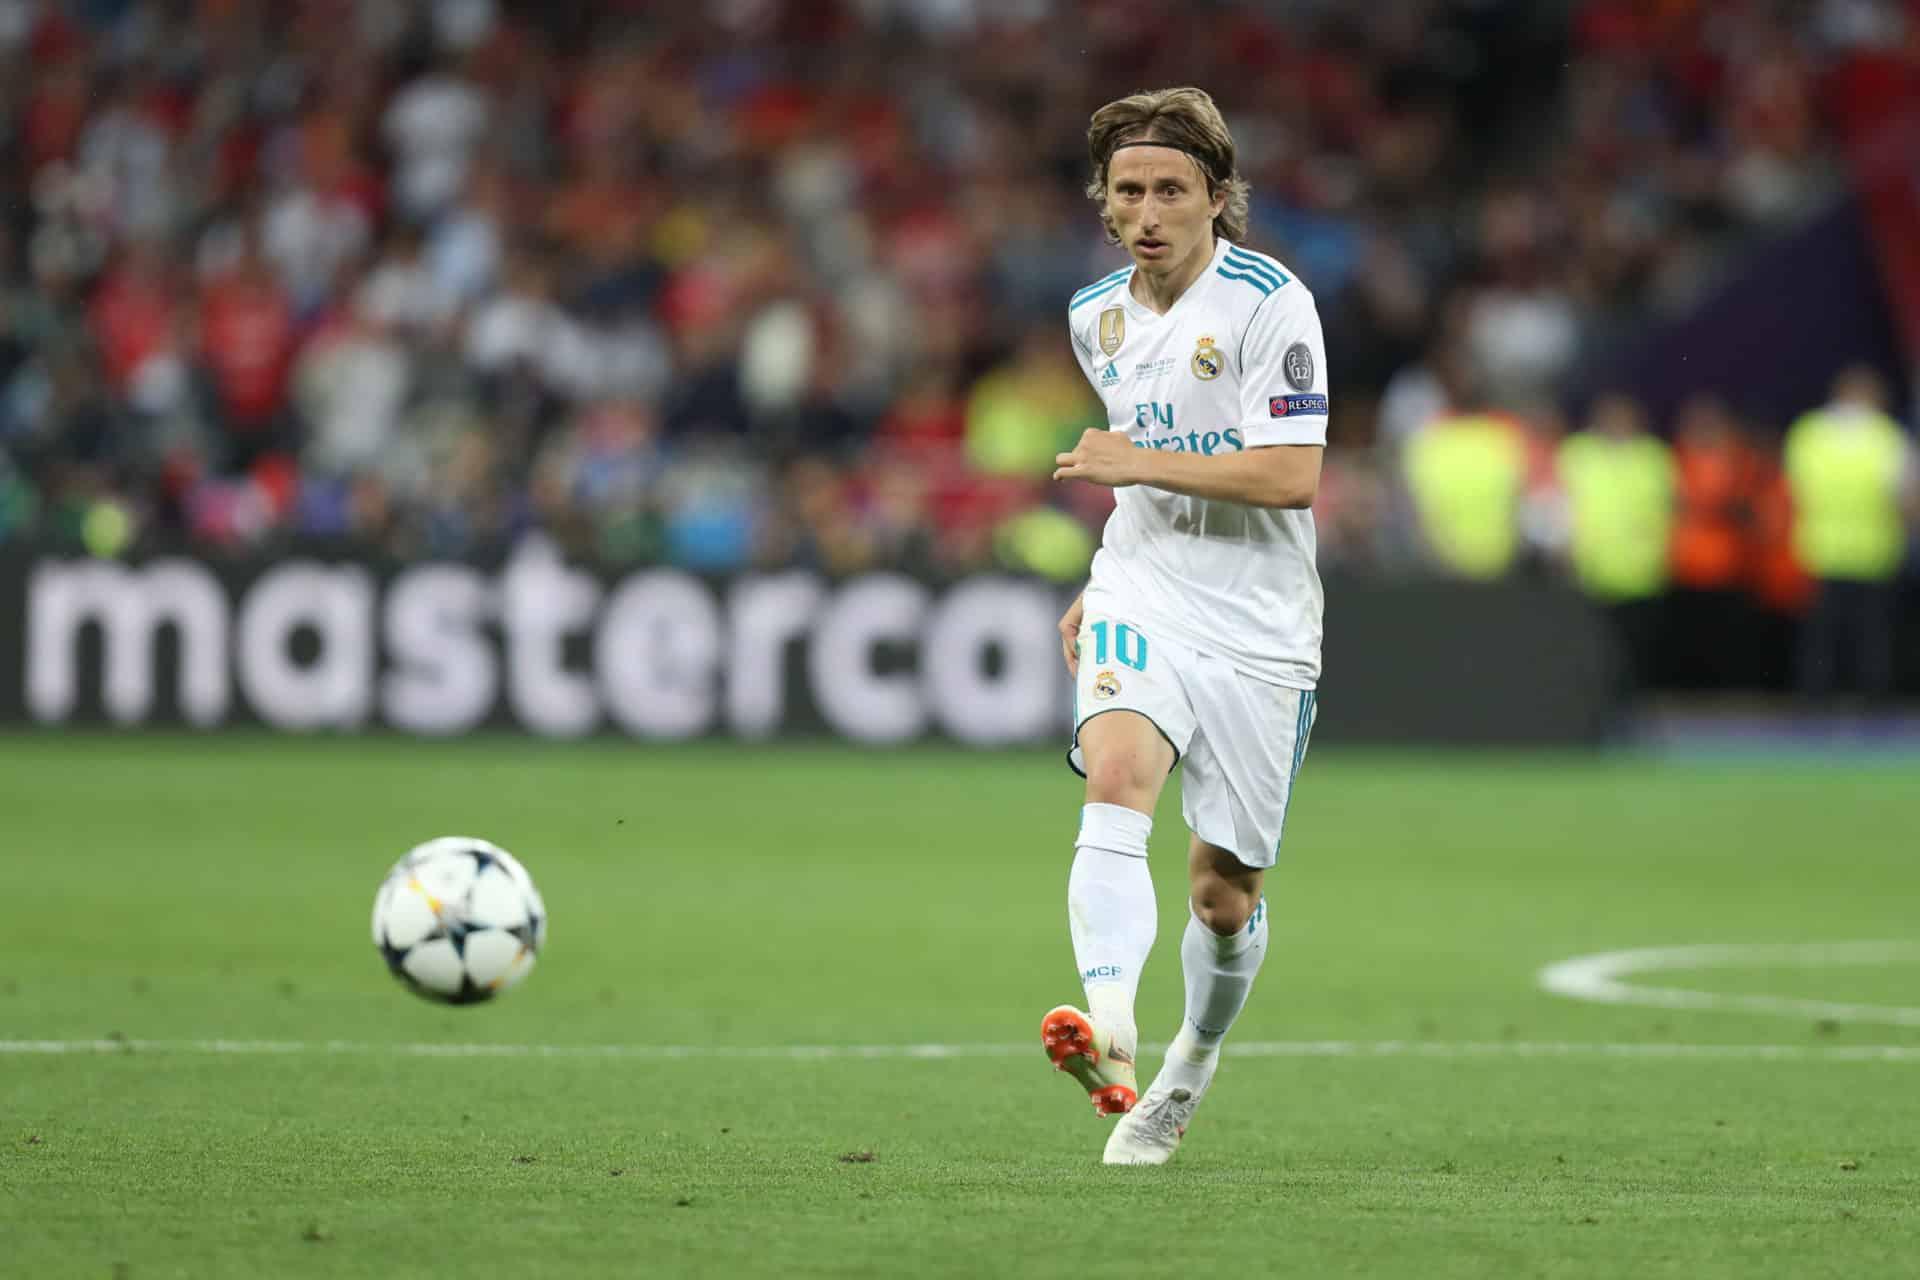 Luka Modrić, Real Madrid